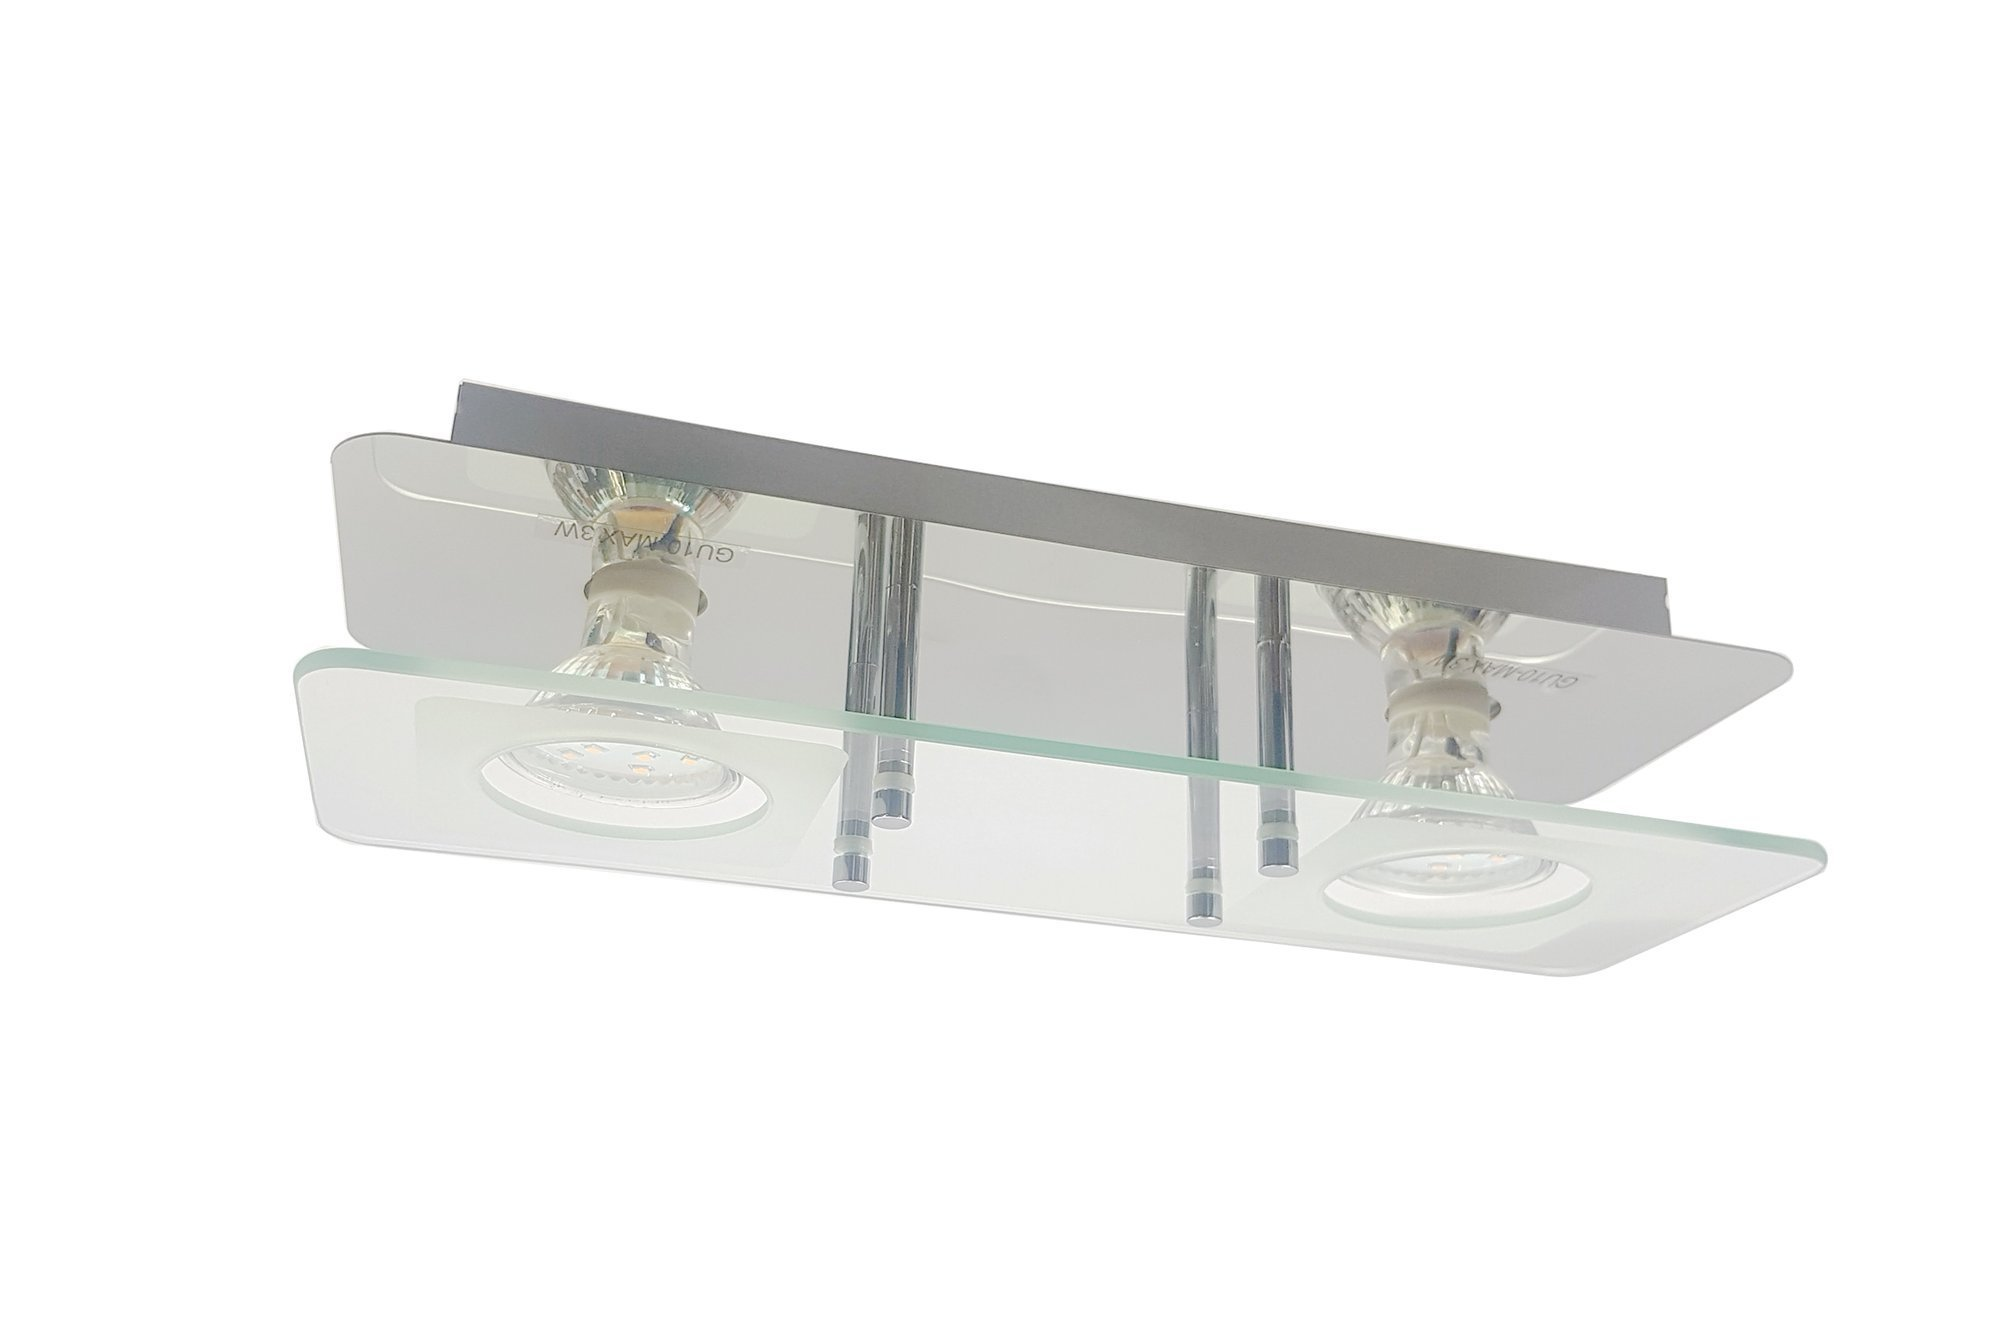 Ceiling Light Briloner Vitreo 3513-028 2x GU10 3W